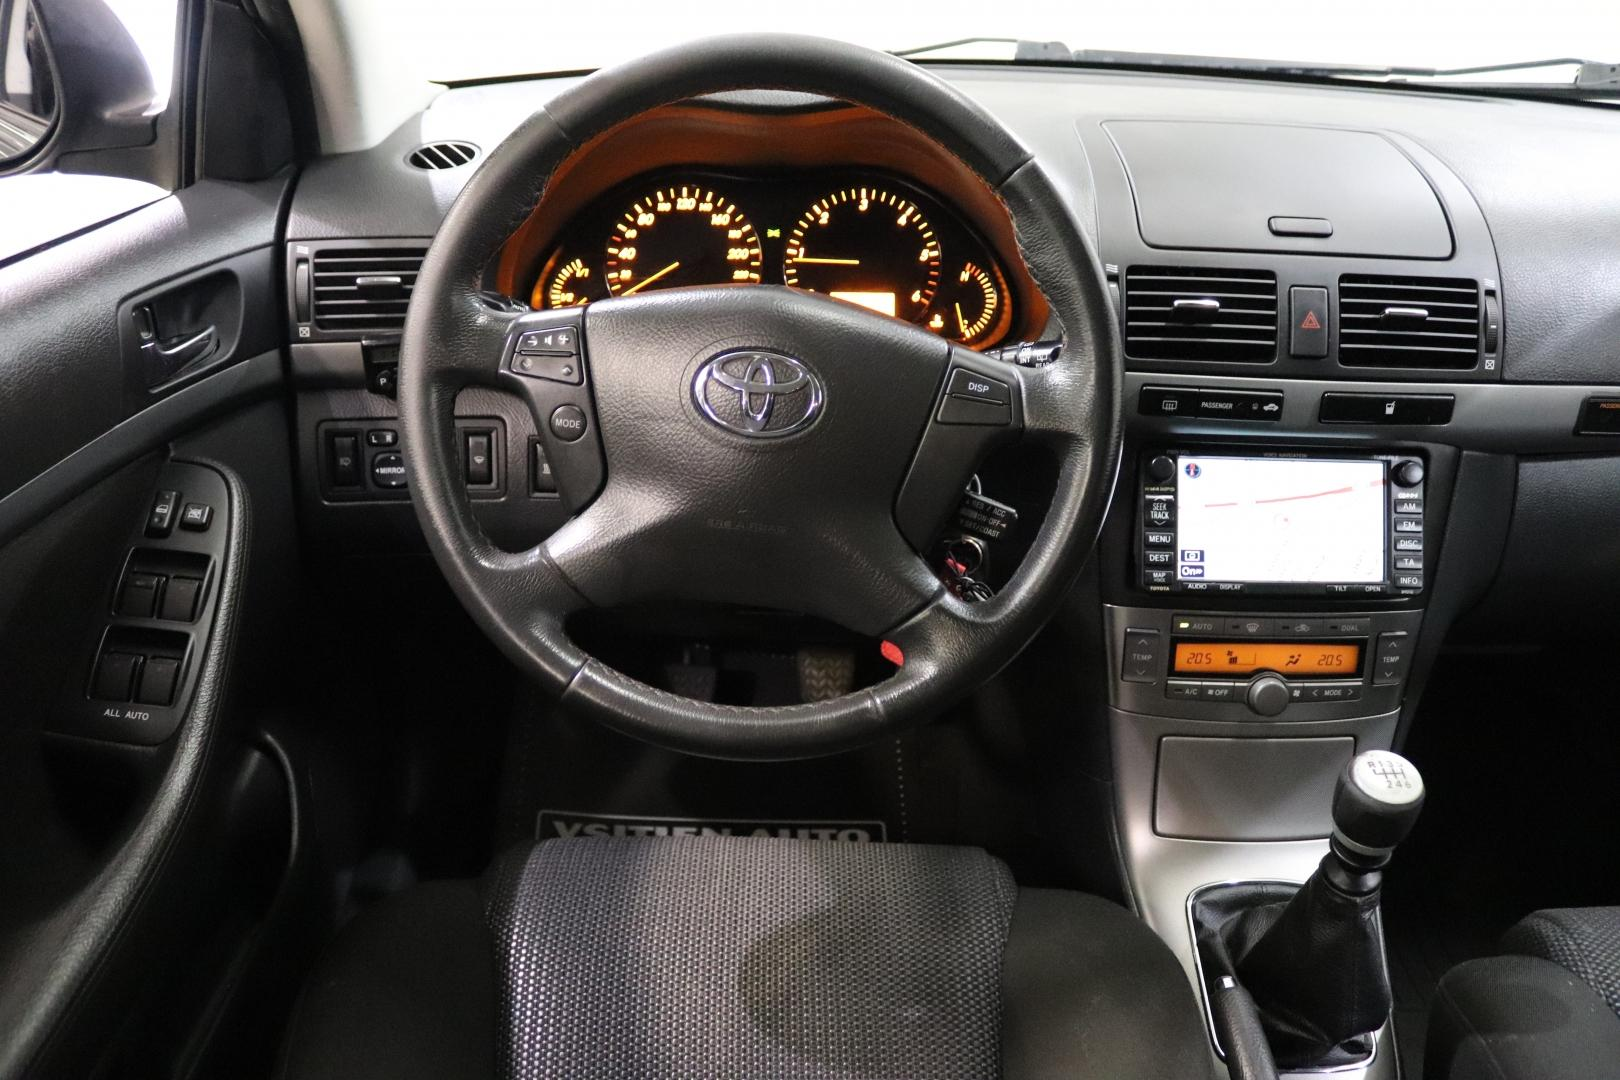 Toyota Avensis, 2.0 D4D 126 Linea Sol Technical Wagon